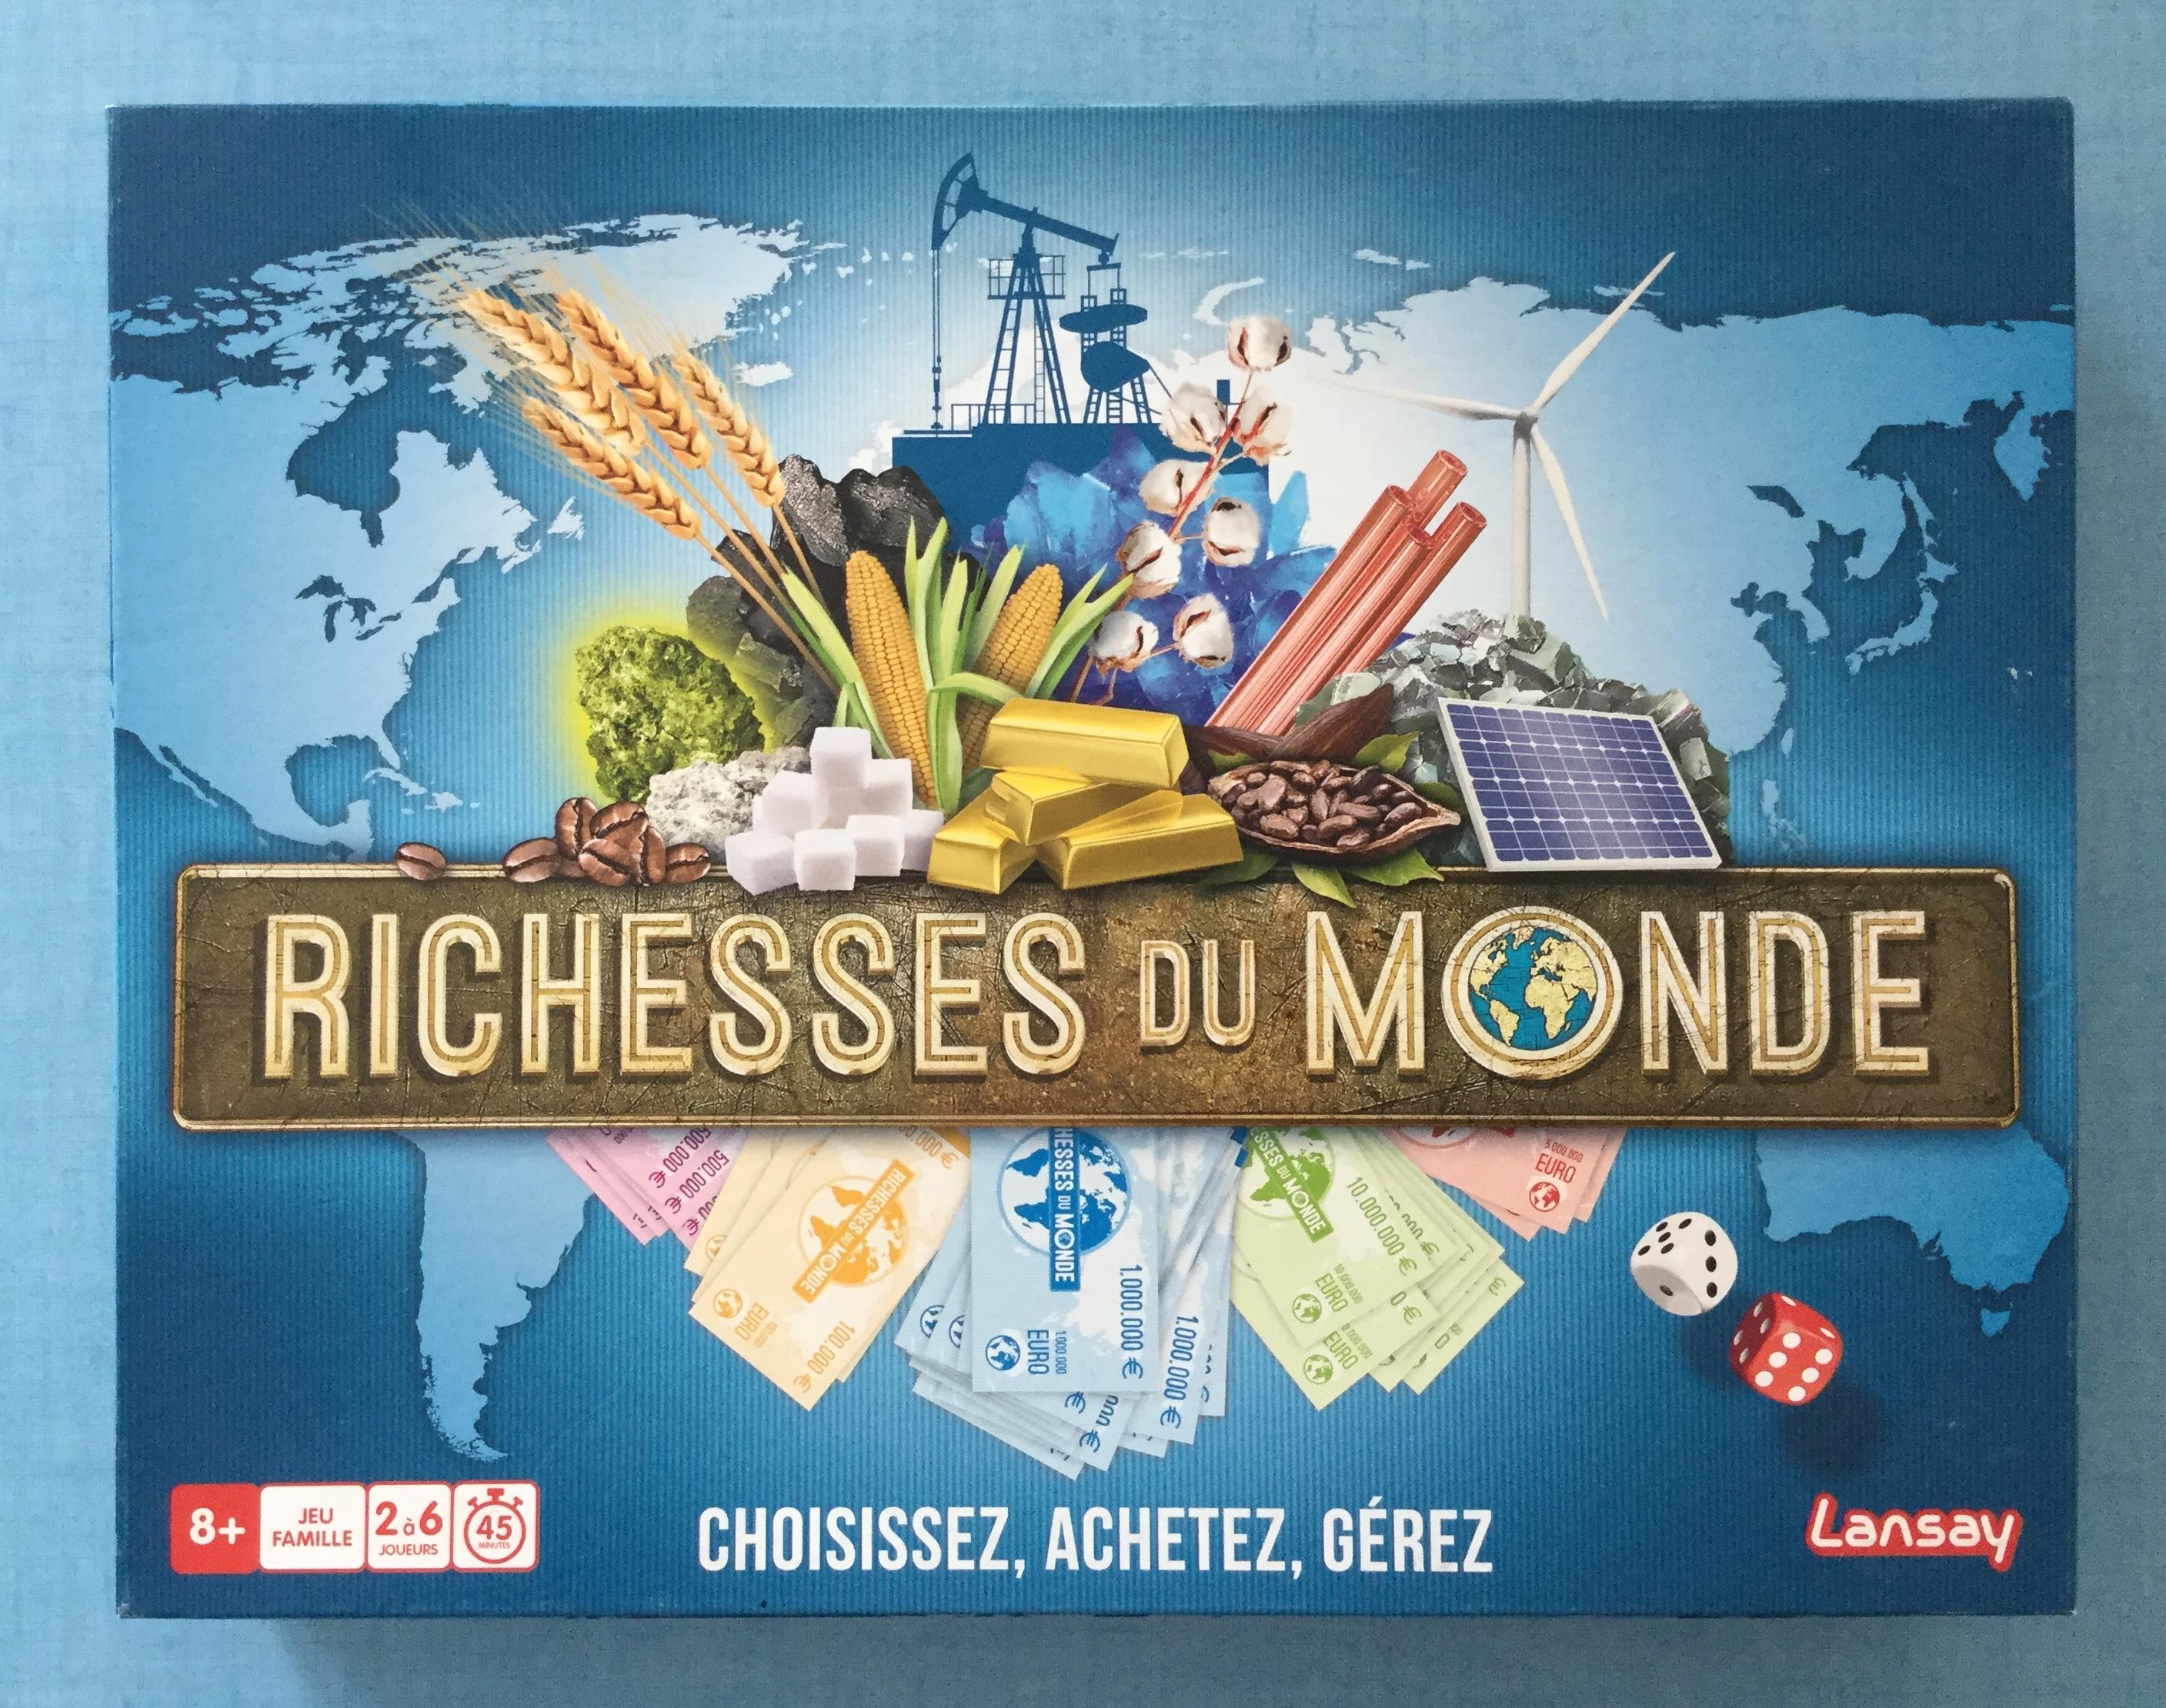 Richesses du monde Lansay